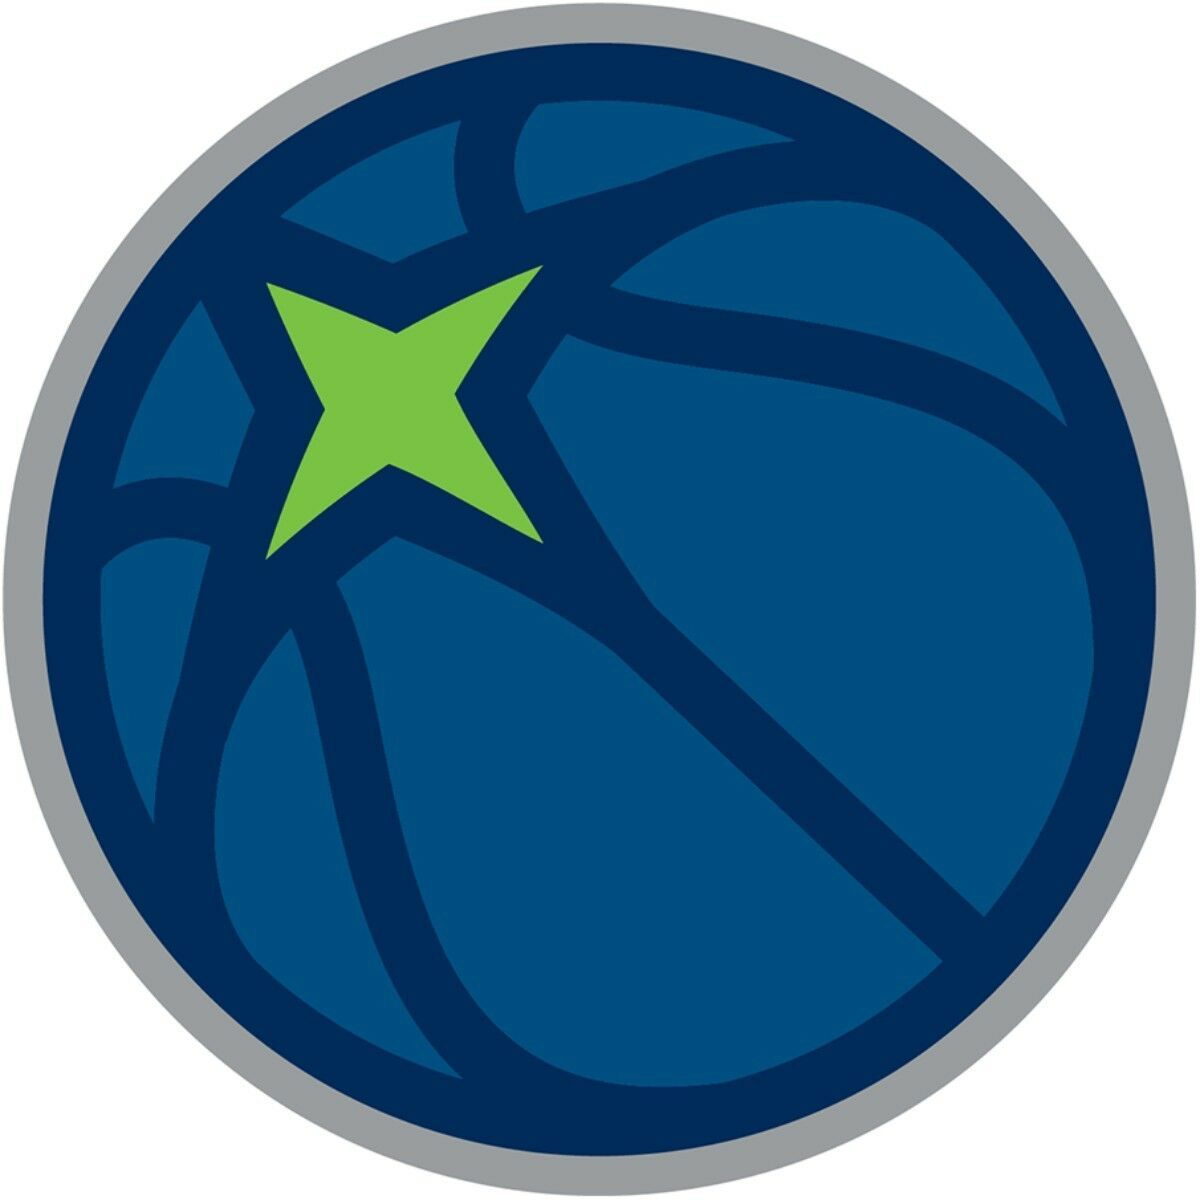 Minnesota Timberwolves #10 NBA Team Logo Vinyl Decal Sticker Car Window Wall - $6.28 - $11.10